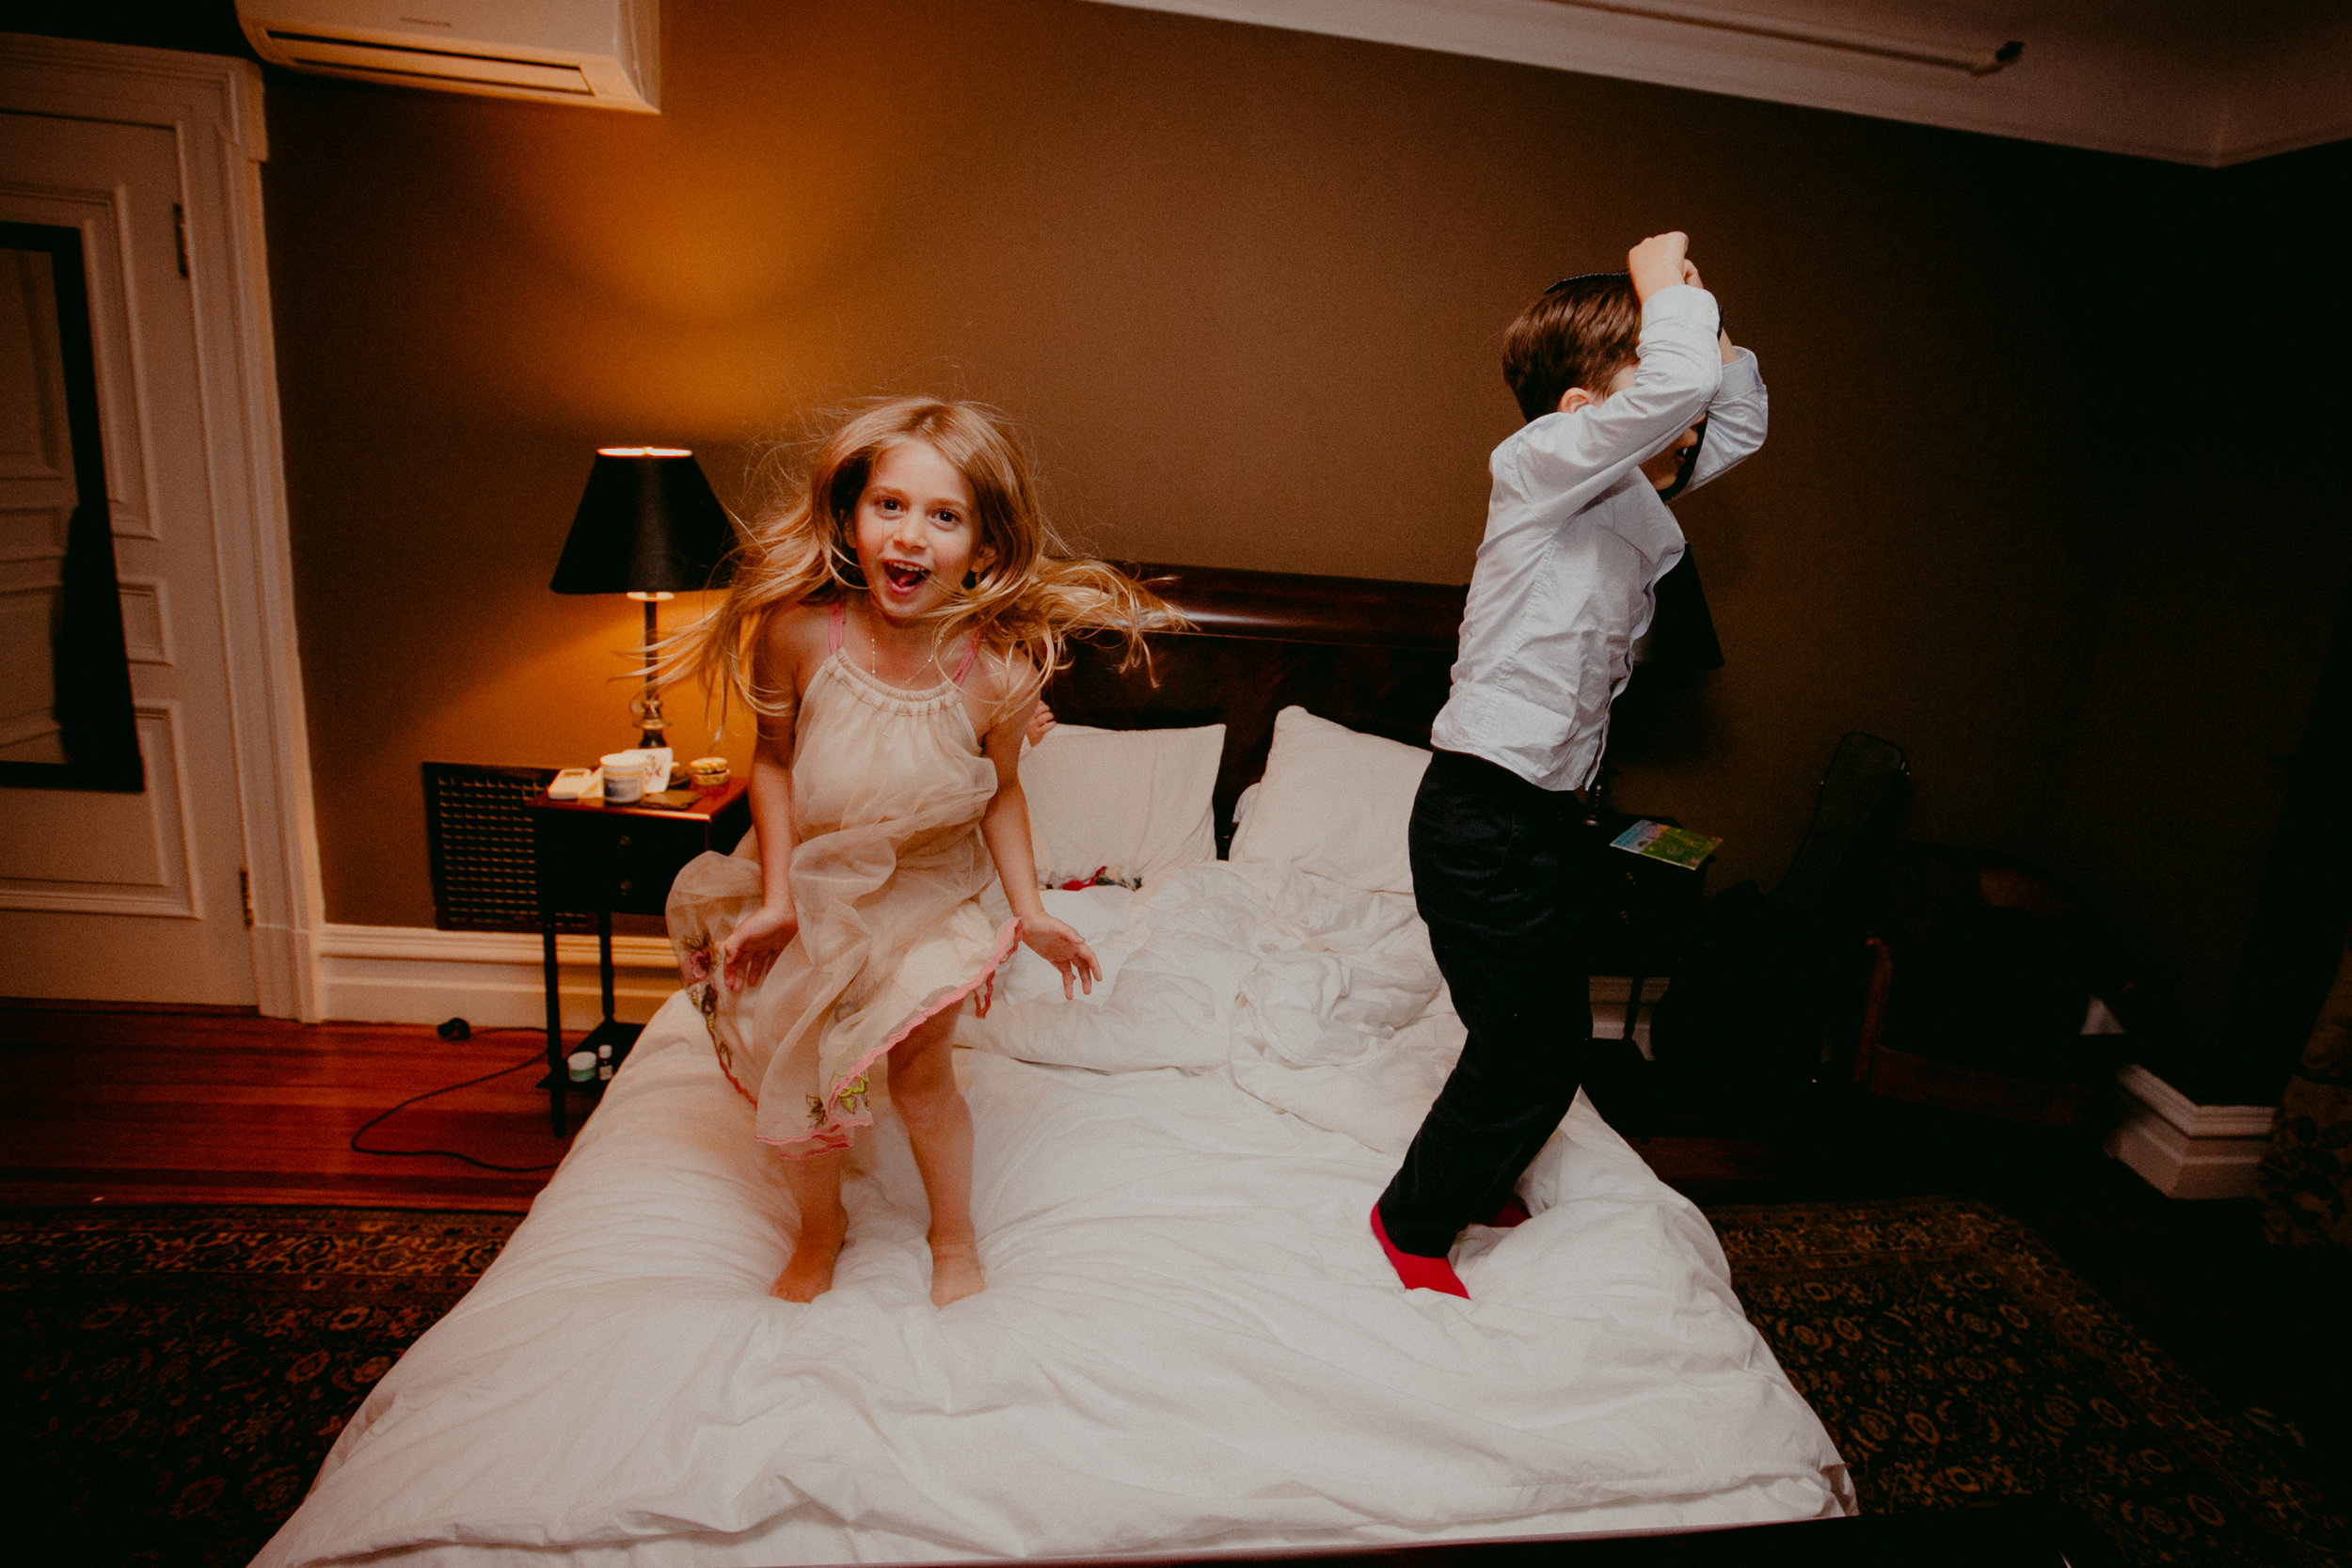 Tiger_House_The_Inn_at_Hudson-Wedding_Chellise_Michael_Photography-562.jpg